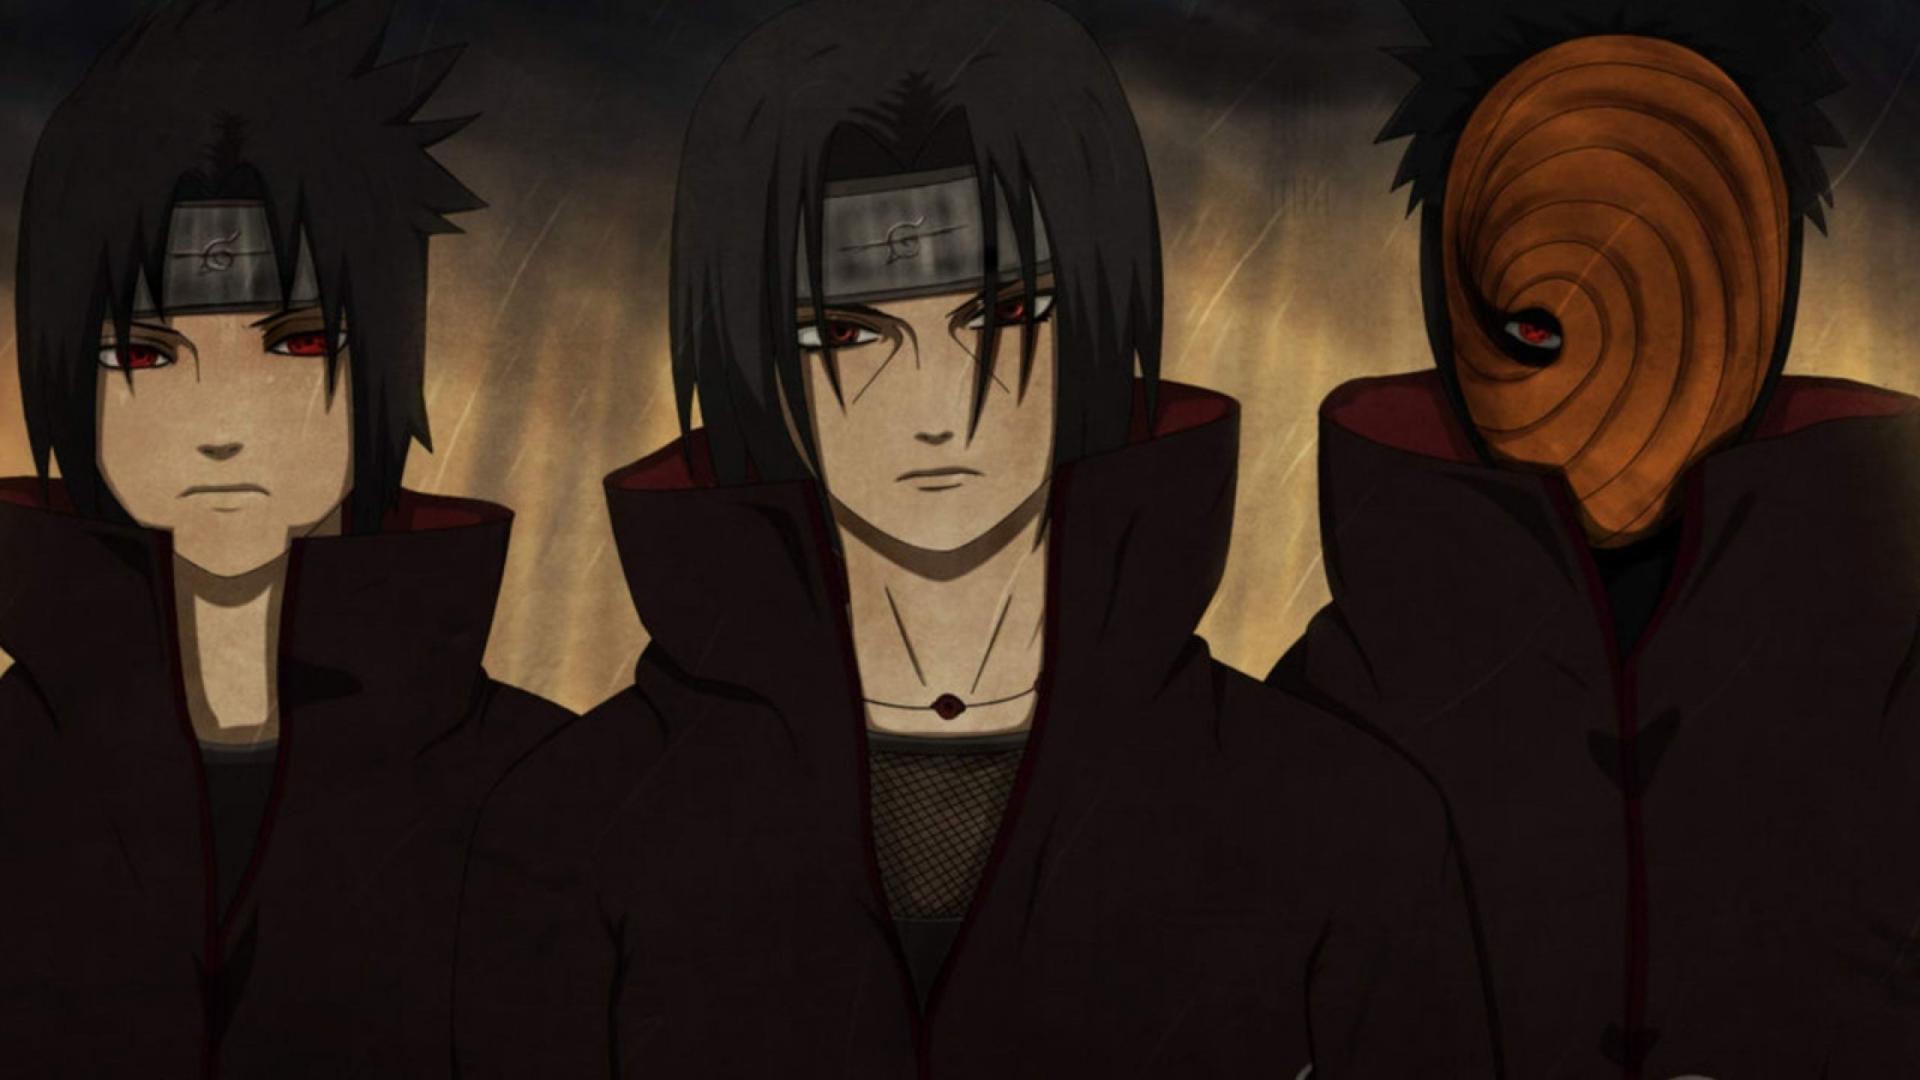 A21 Naruto Uzumaki anime HD Desktop background wallpapers downloads